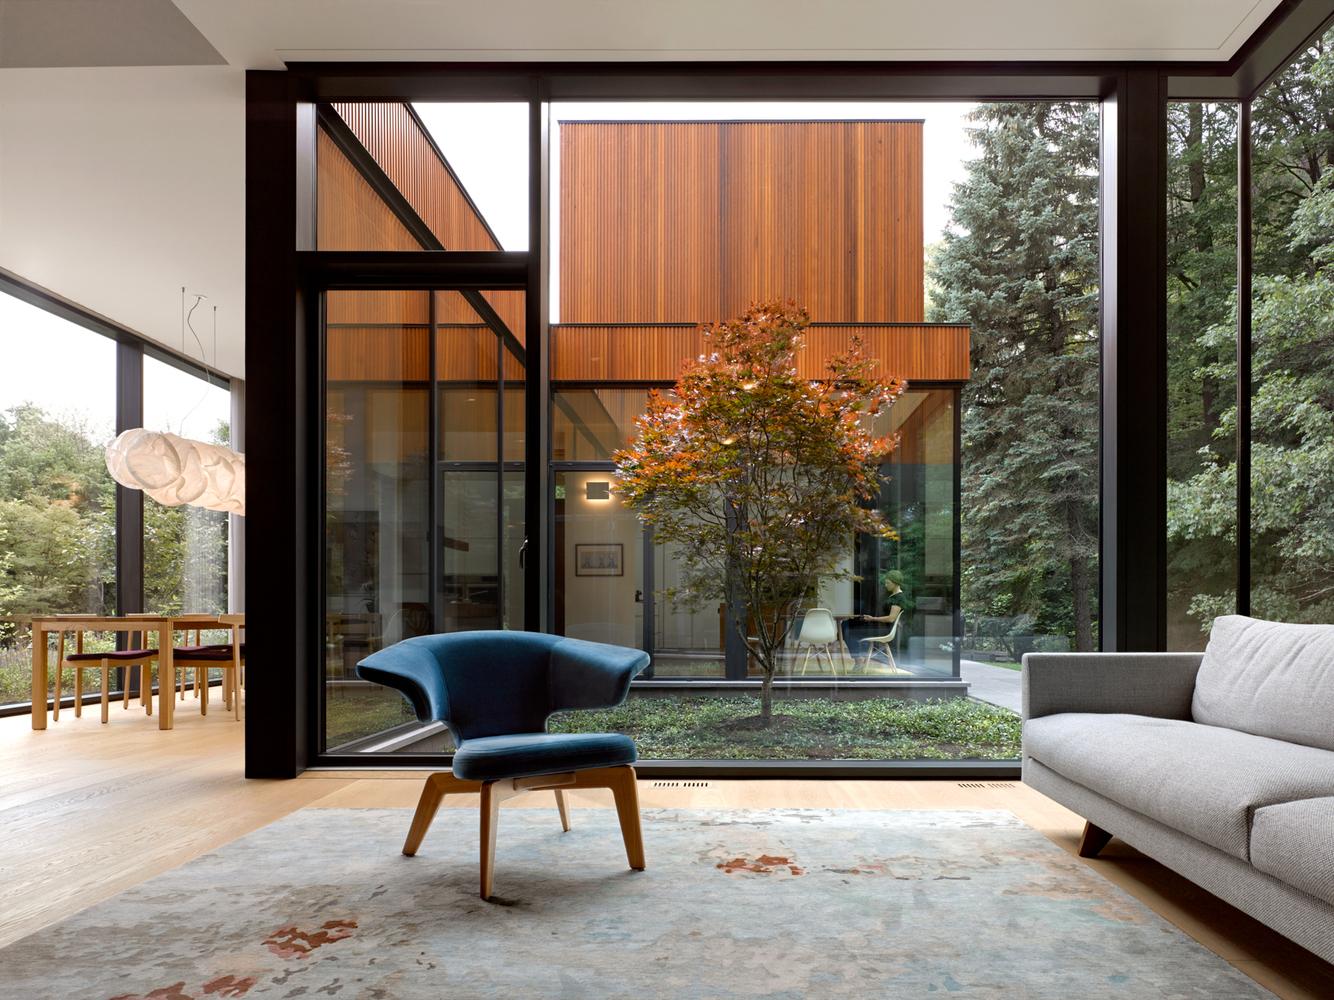 House on Ancaster Creek / Williamson Williamson, Canada, 2016 [1,334px × 1,000px]